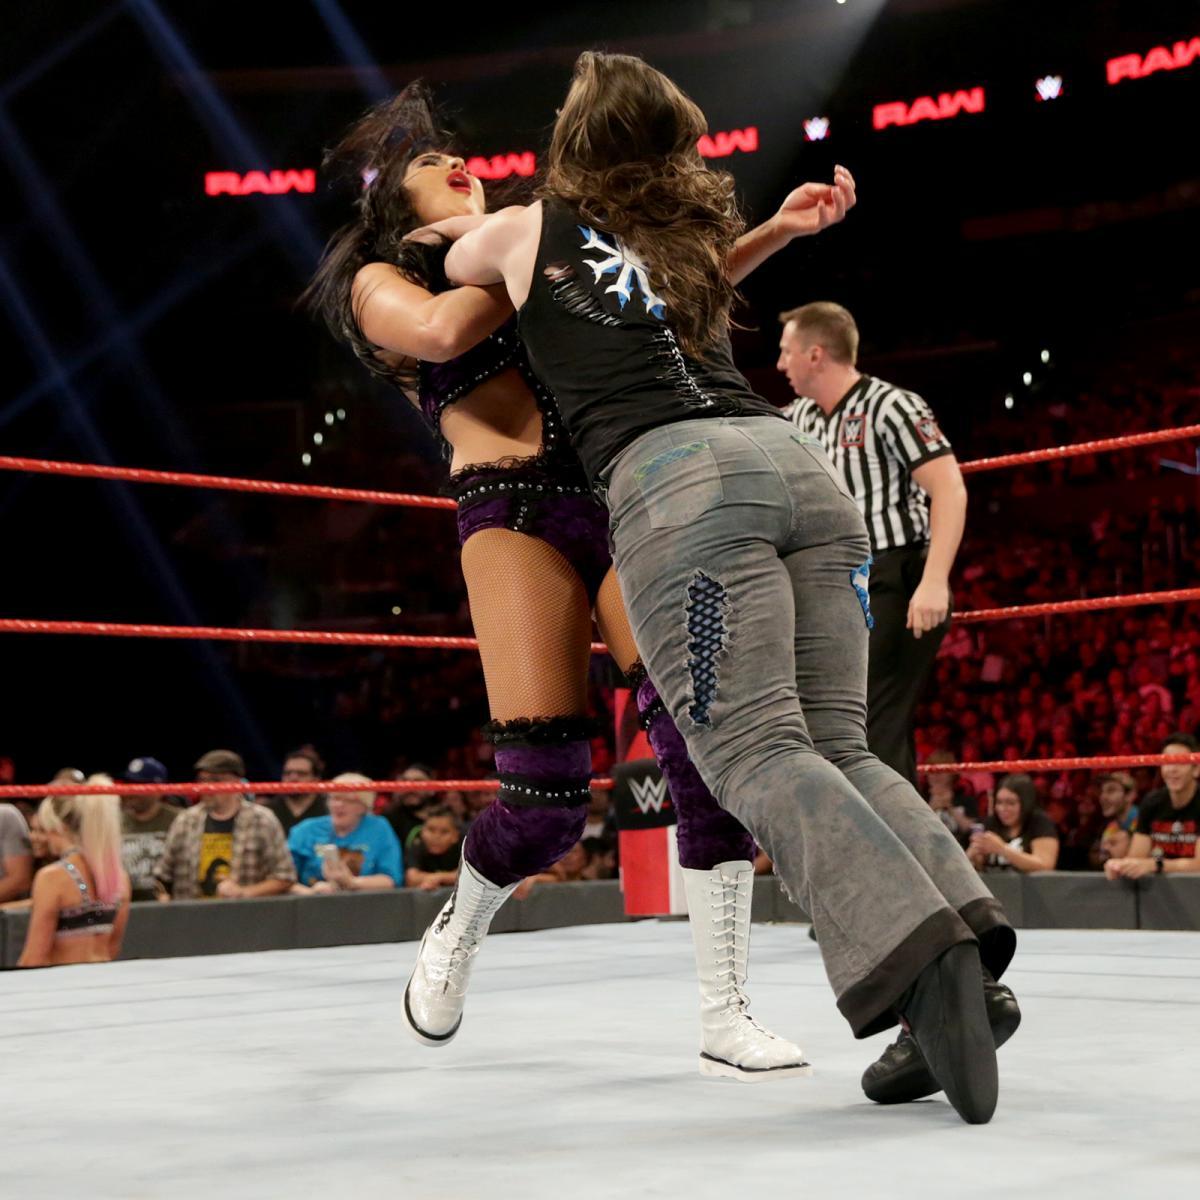 Raw 6/17/19 ~ The IIconics vs Alexa Bliss/Nikki traverser, croix